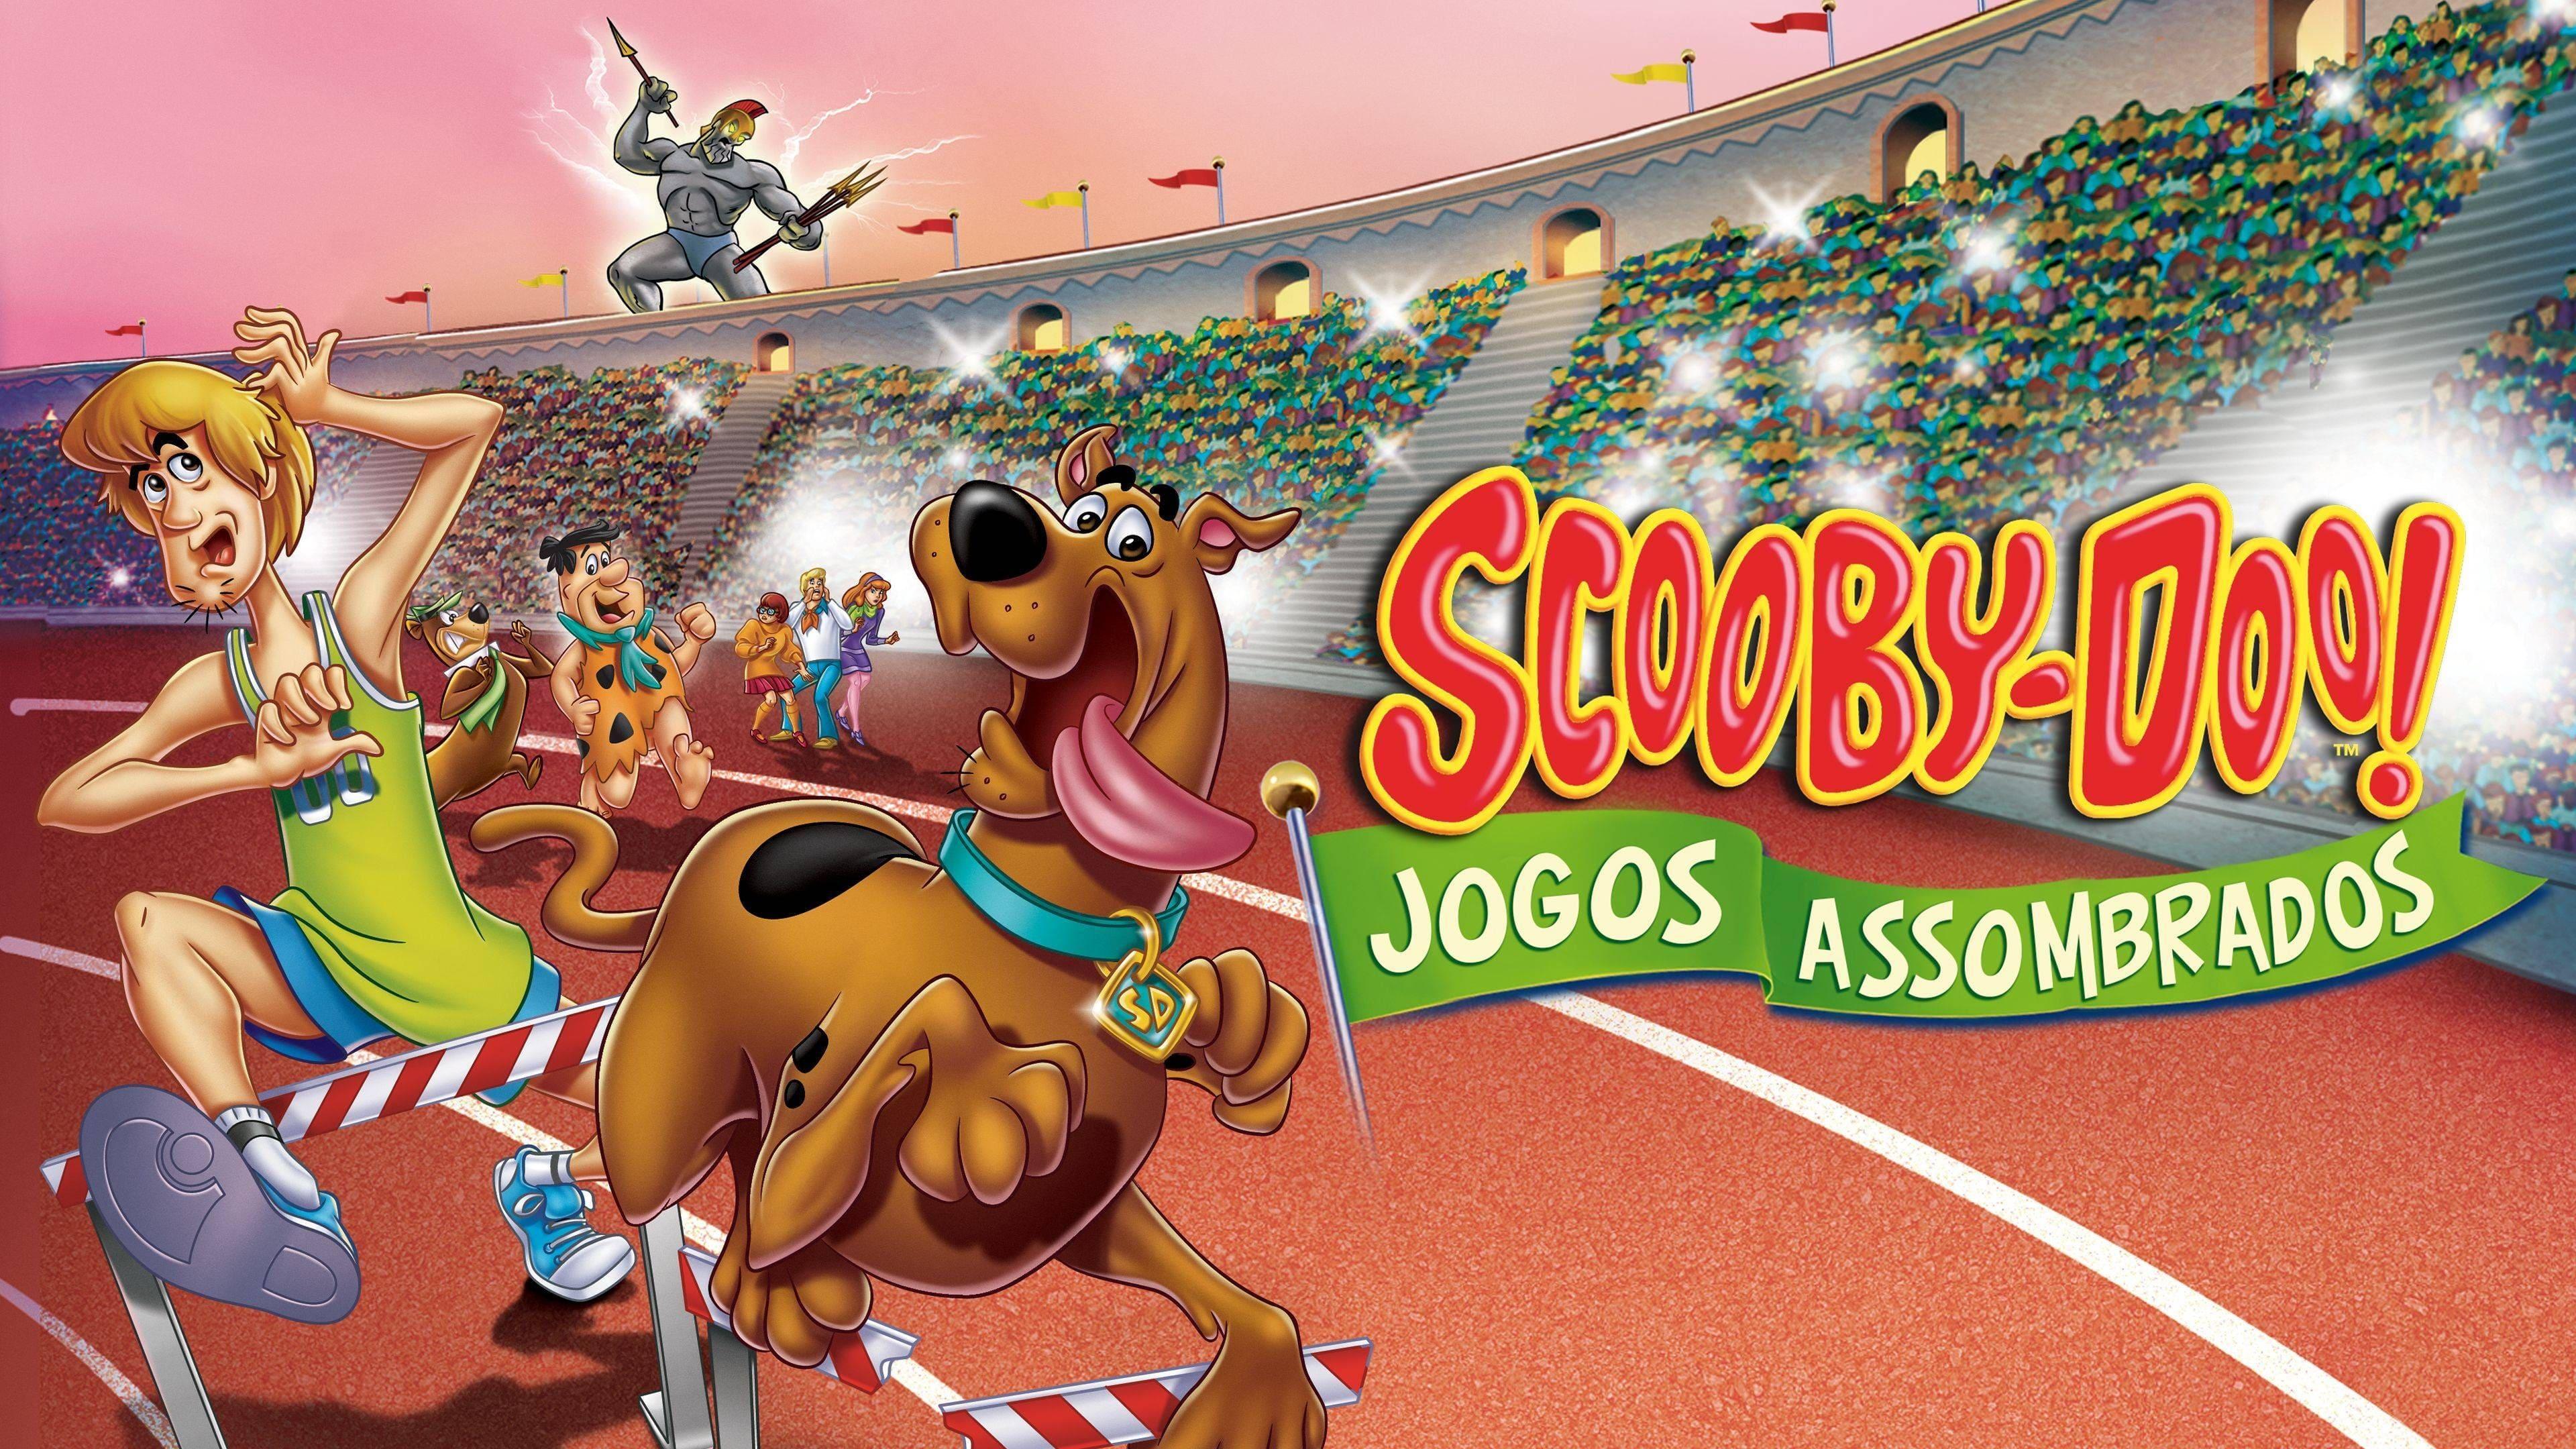 Scooby-Doo! Spooky Games (2012)